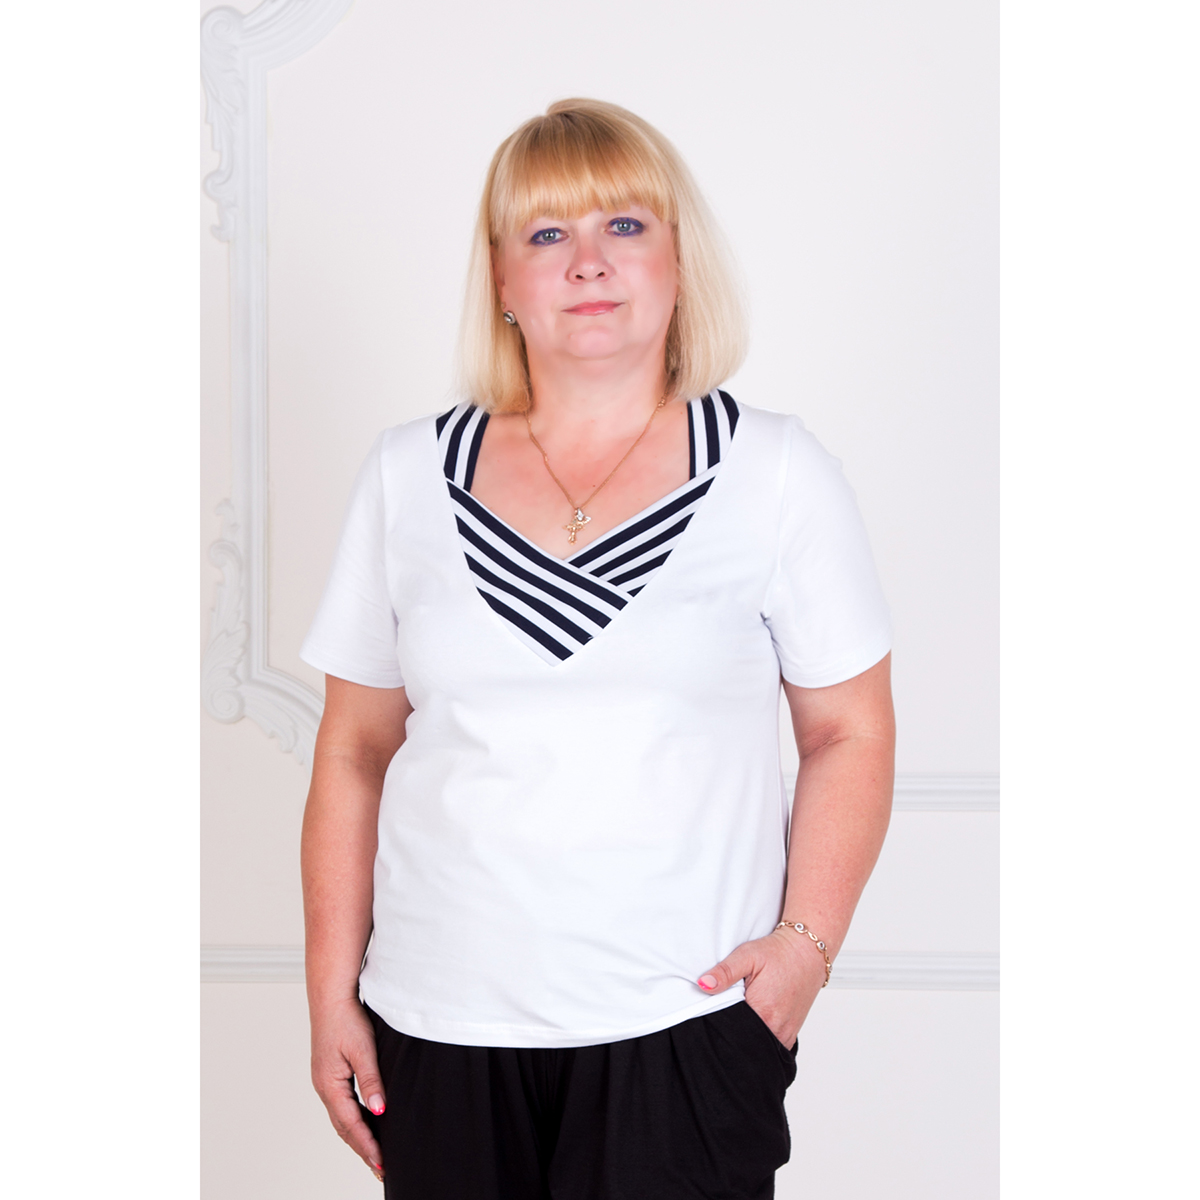 Женская блуза Аманда, размер 54Блузки, майки, кофты<br>Обхват груди:108 см<br>Обхват талии:88 см<br>Обхват бедер:116 см<br>Рост:167 см<br><br>Тип: Жен. блуза<br>Размер: 54<br>Материал: Фулайкра